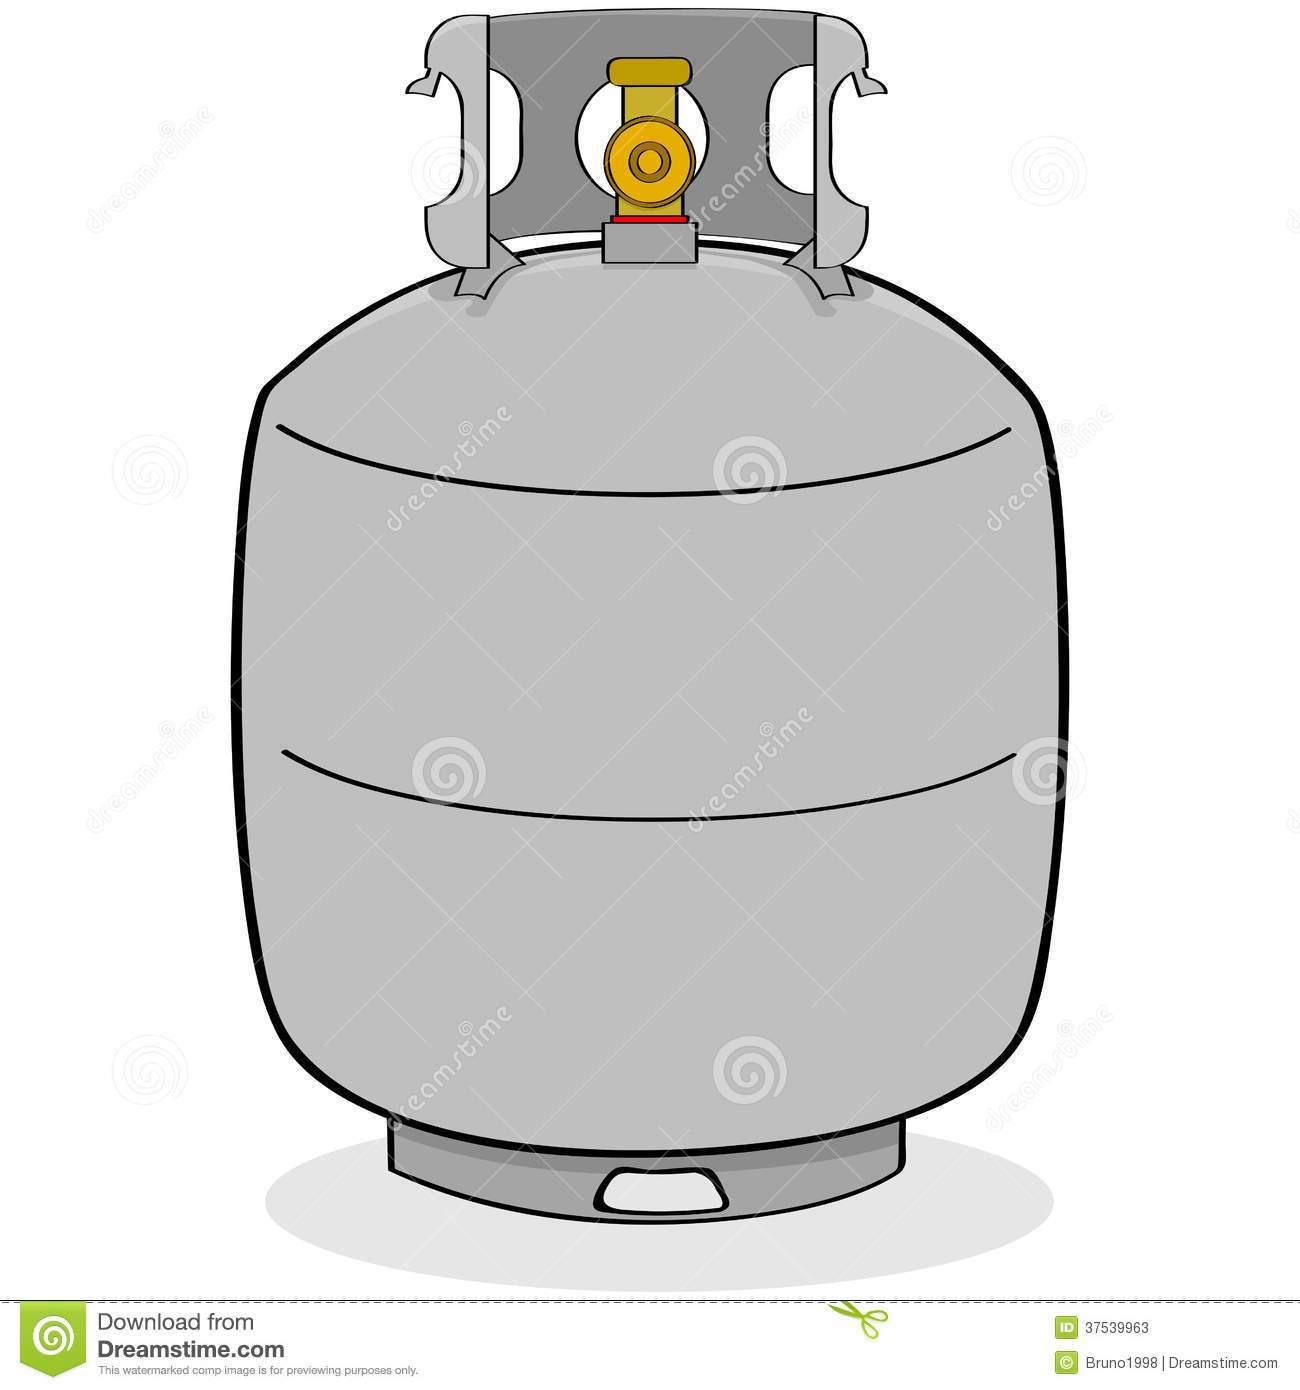 Lpg tank clipart 4 » Clipart Portal.